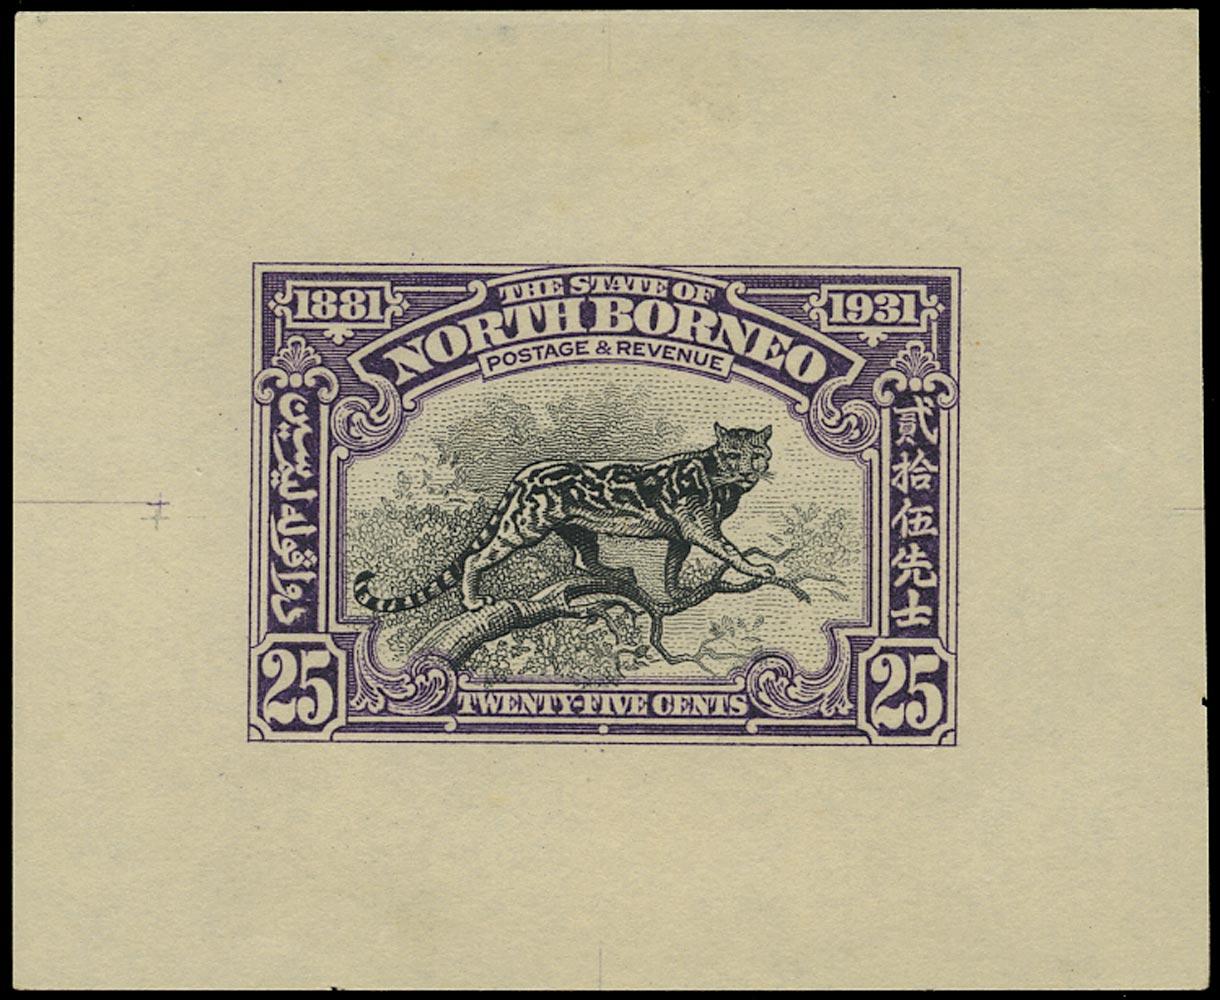 NORTH BORNEO 1931  SG299 Proof